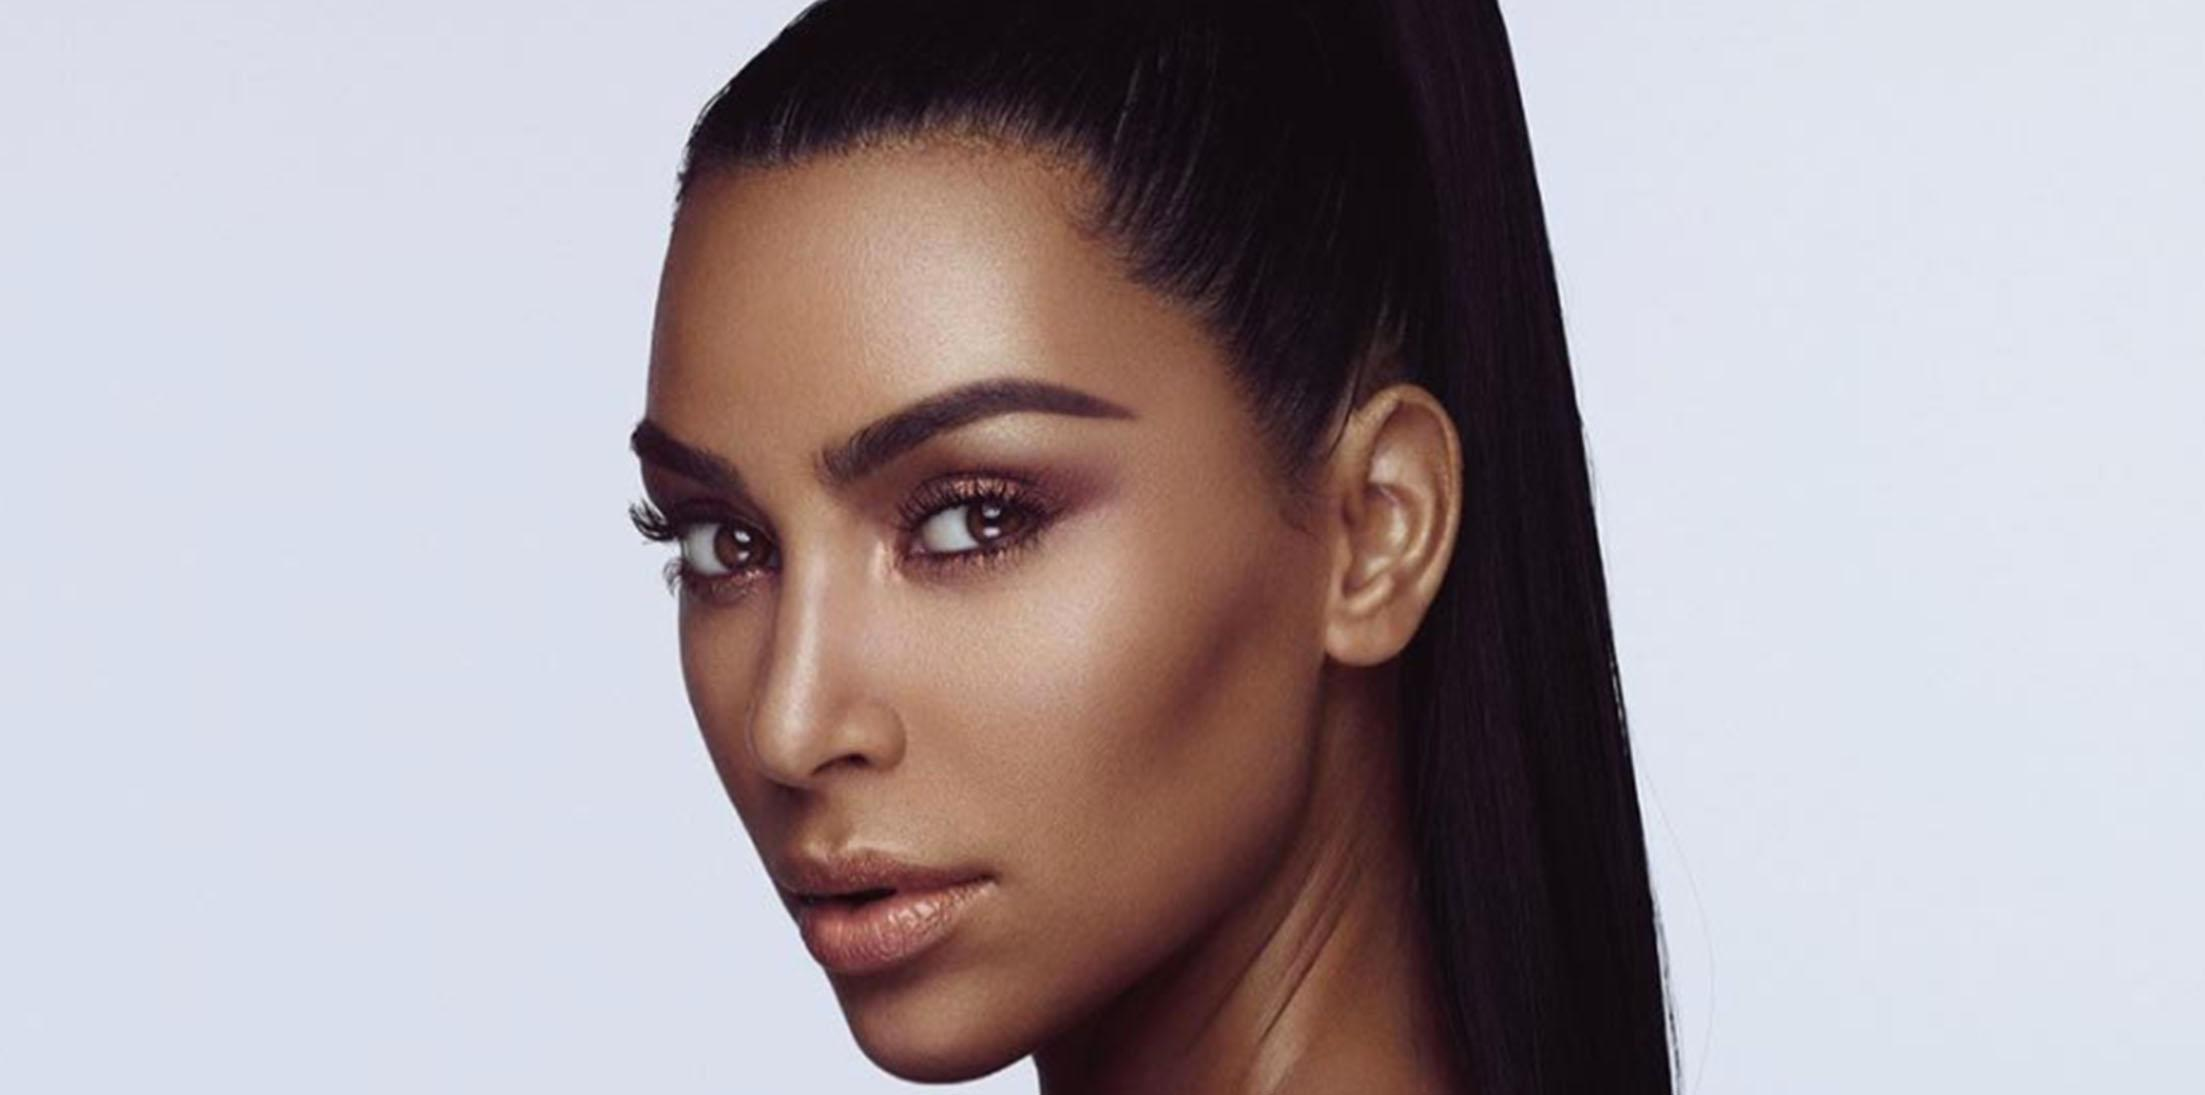 Kim kardashian blackface kkw beauty feature